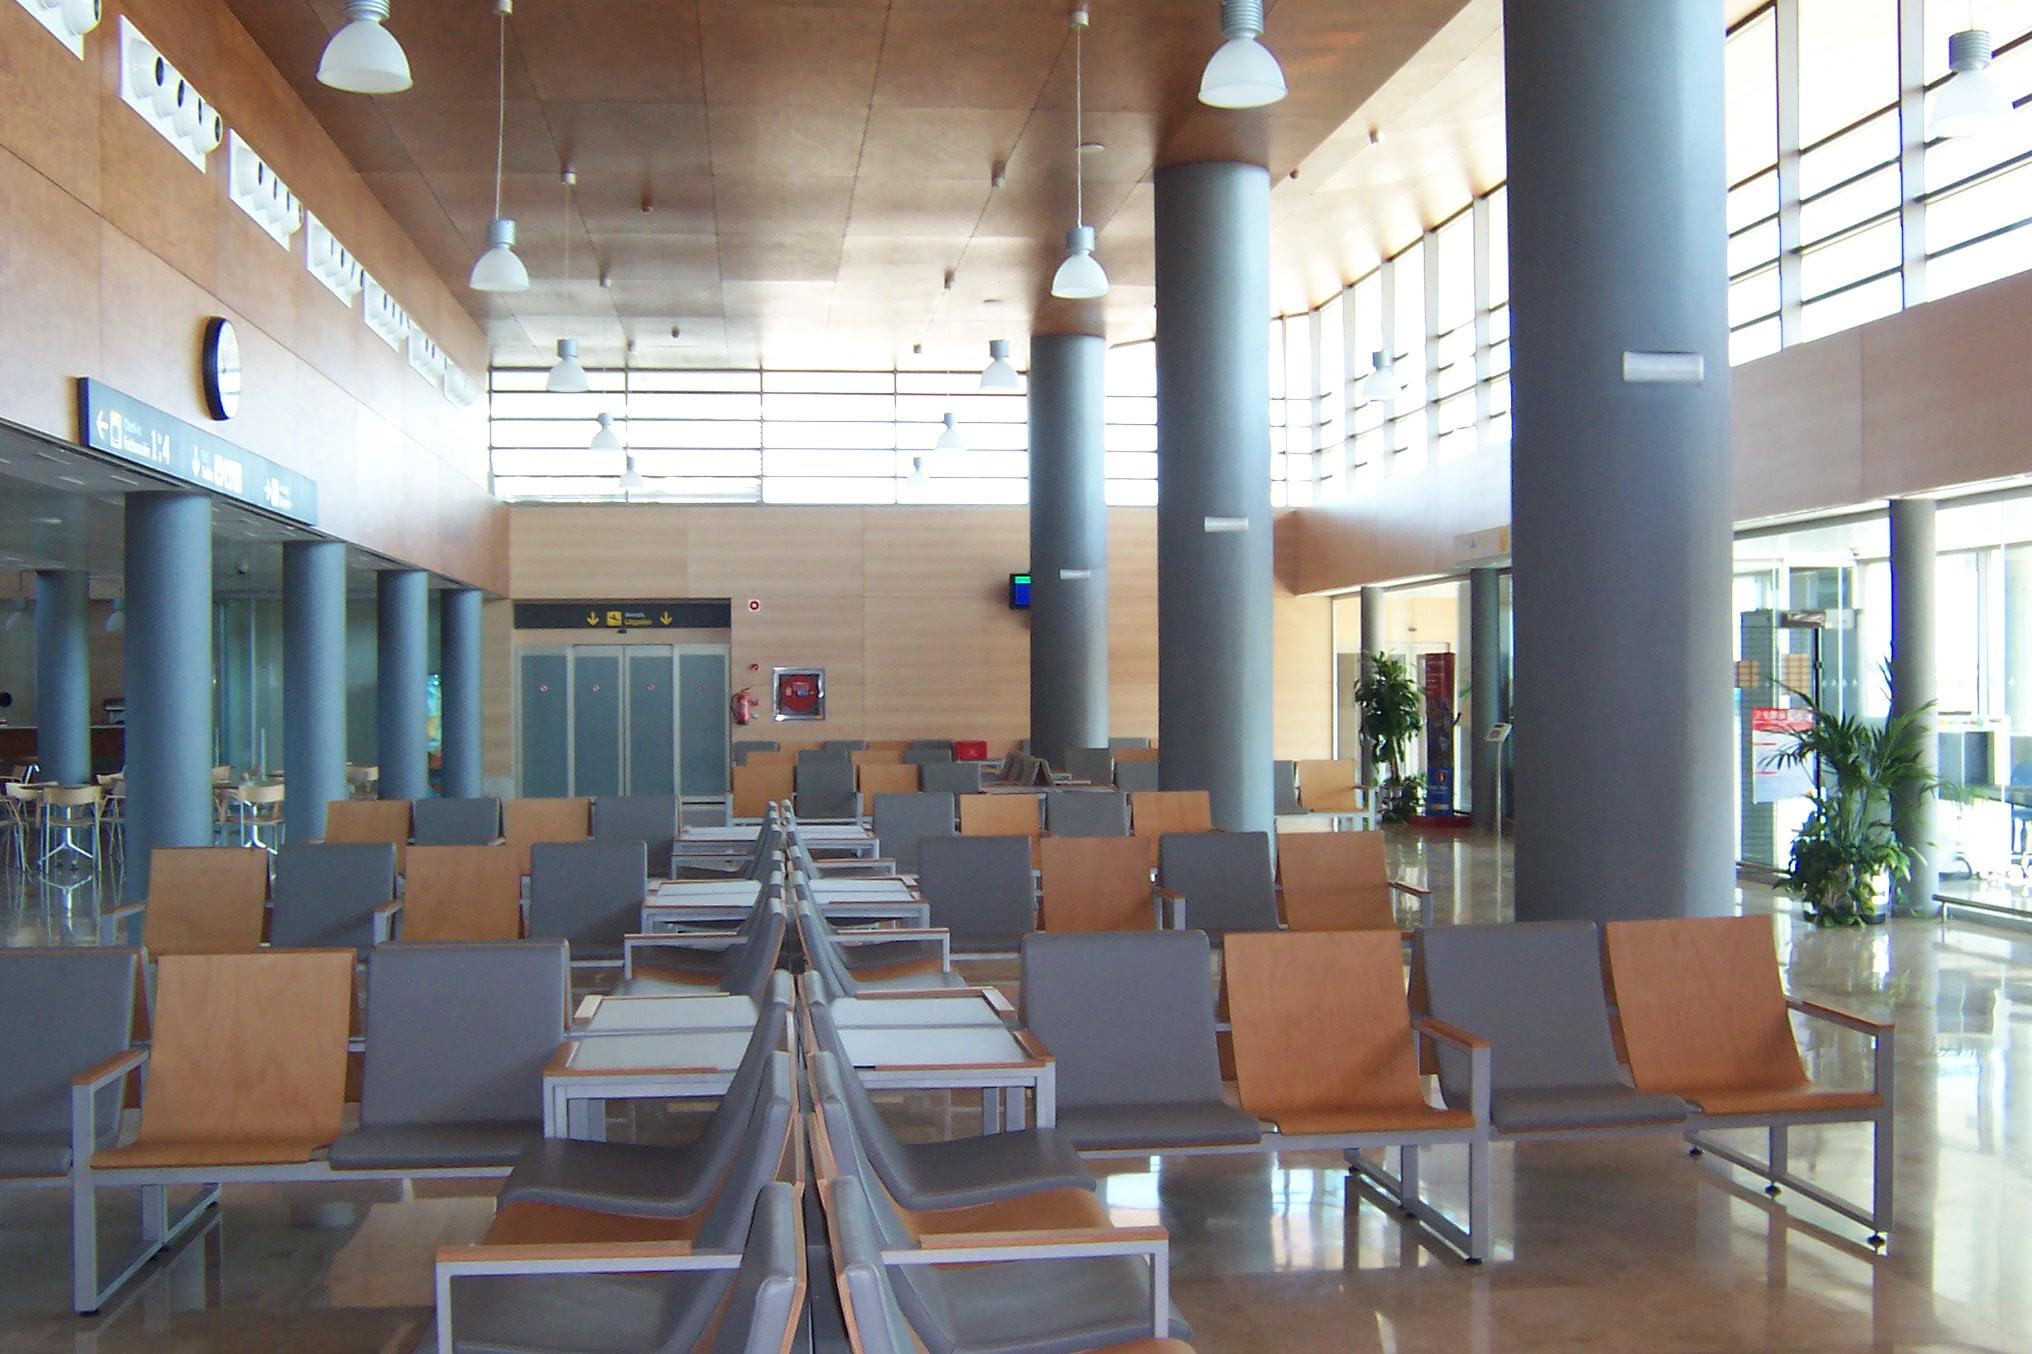 Aeroporto de Albacete